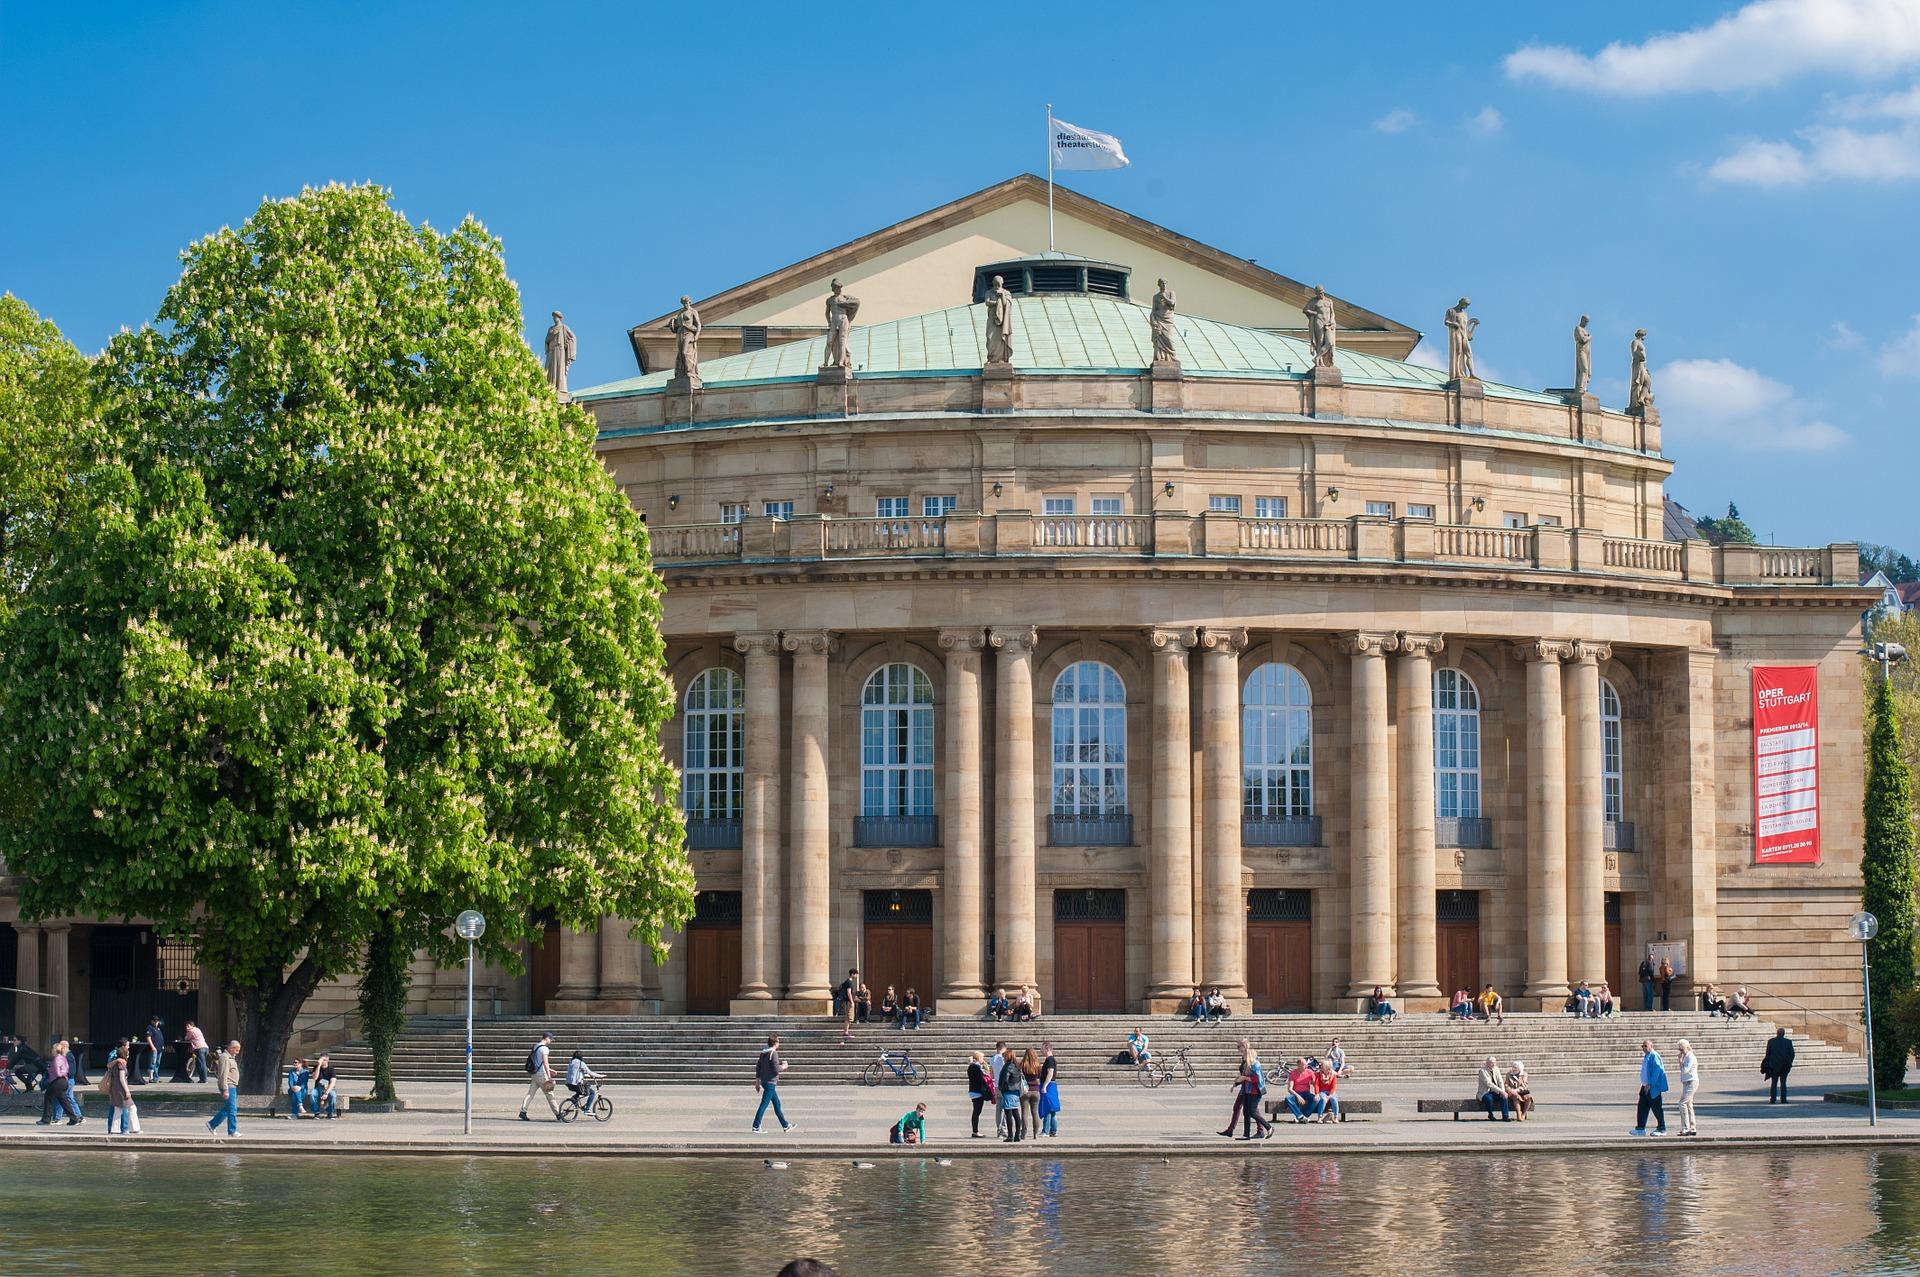 Alles über Sprinter mieten Stuttgart [Guide]